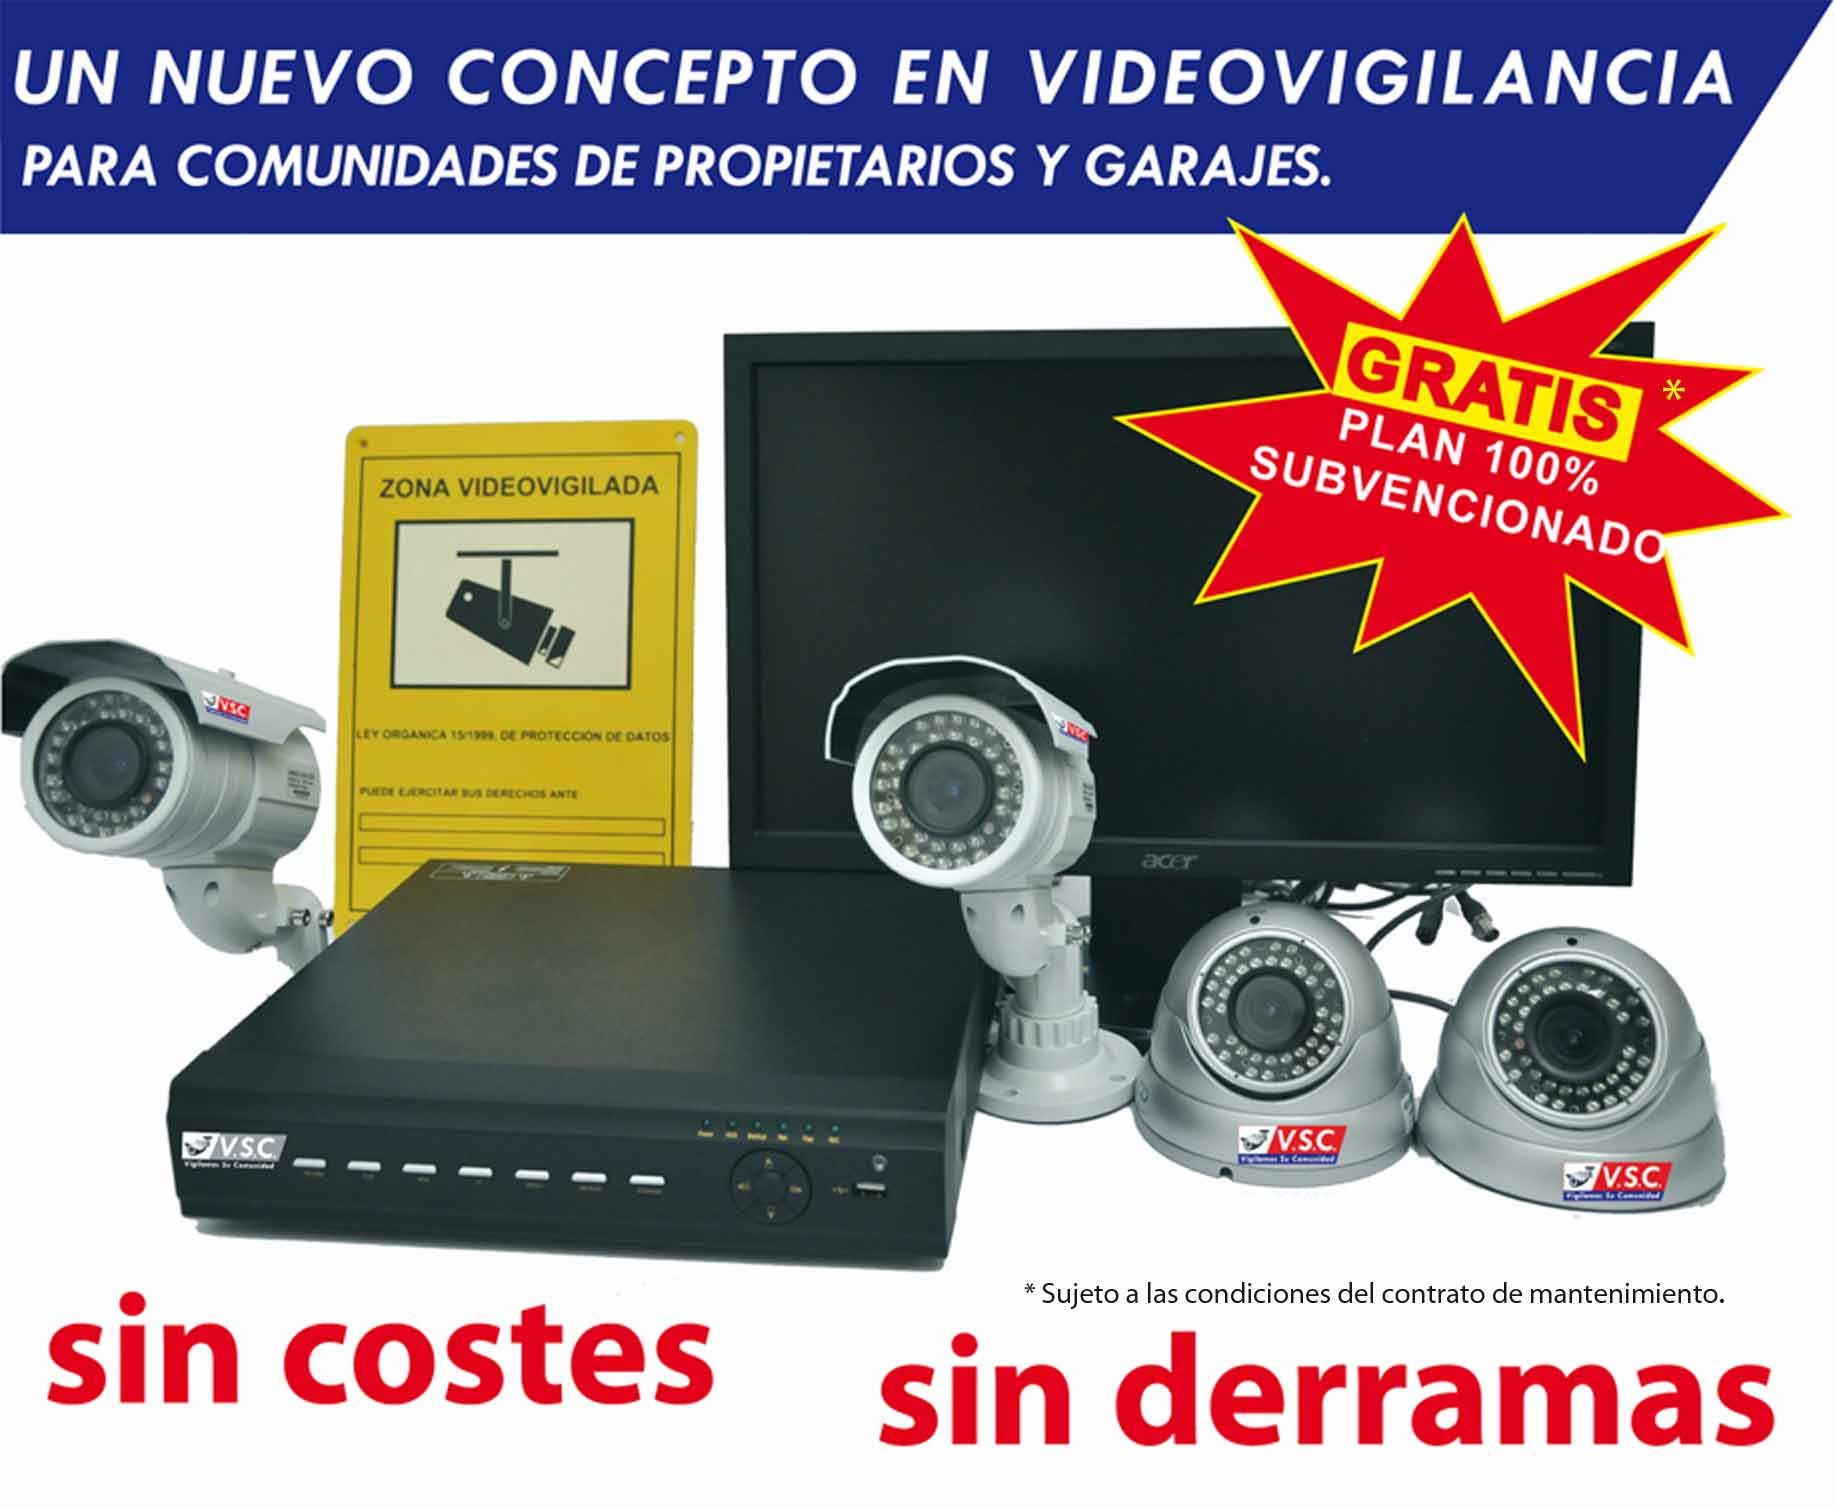 Sistemas de videovigilancia para comunidades